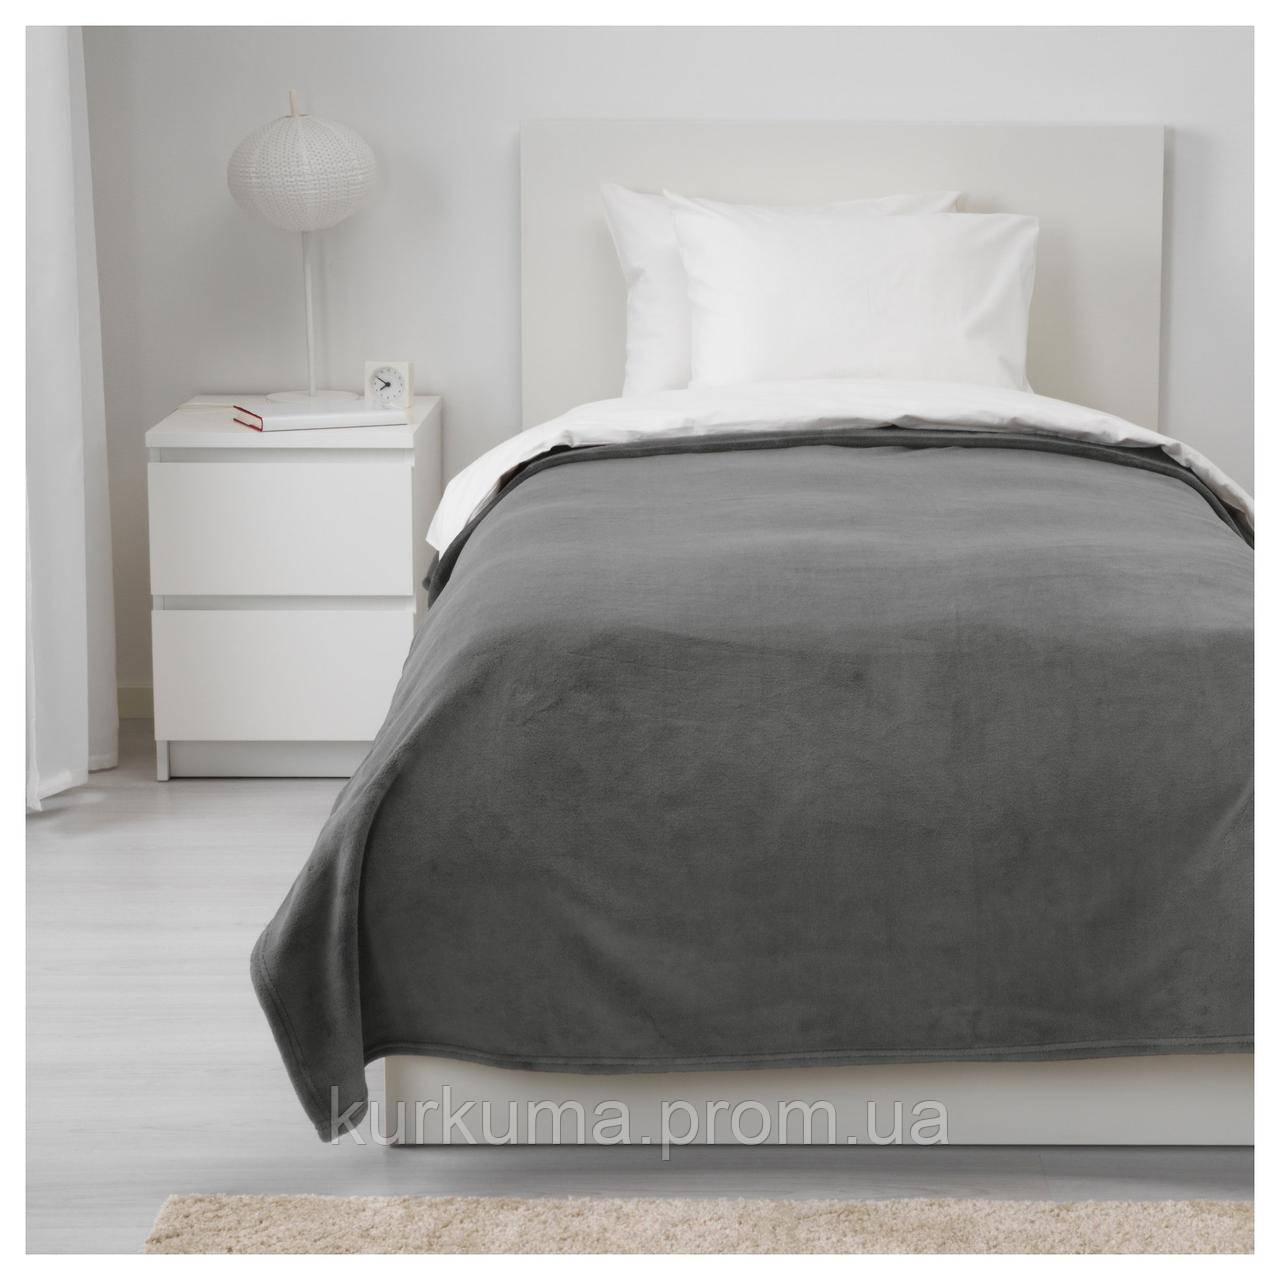 IKEA TRATTVIVA Покрывало, серый  (303.496.78)